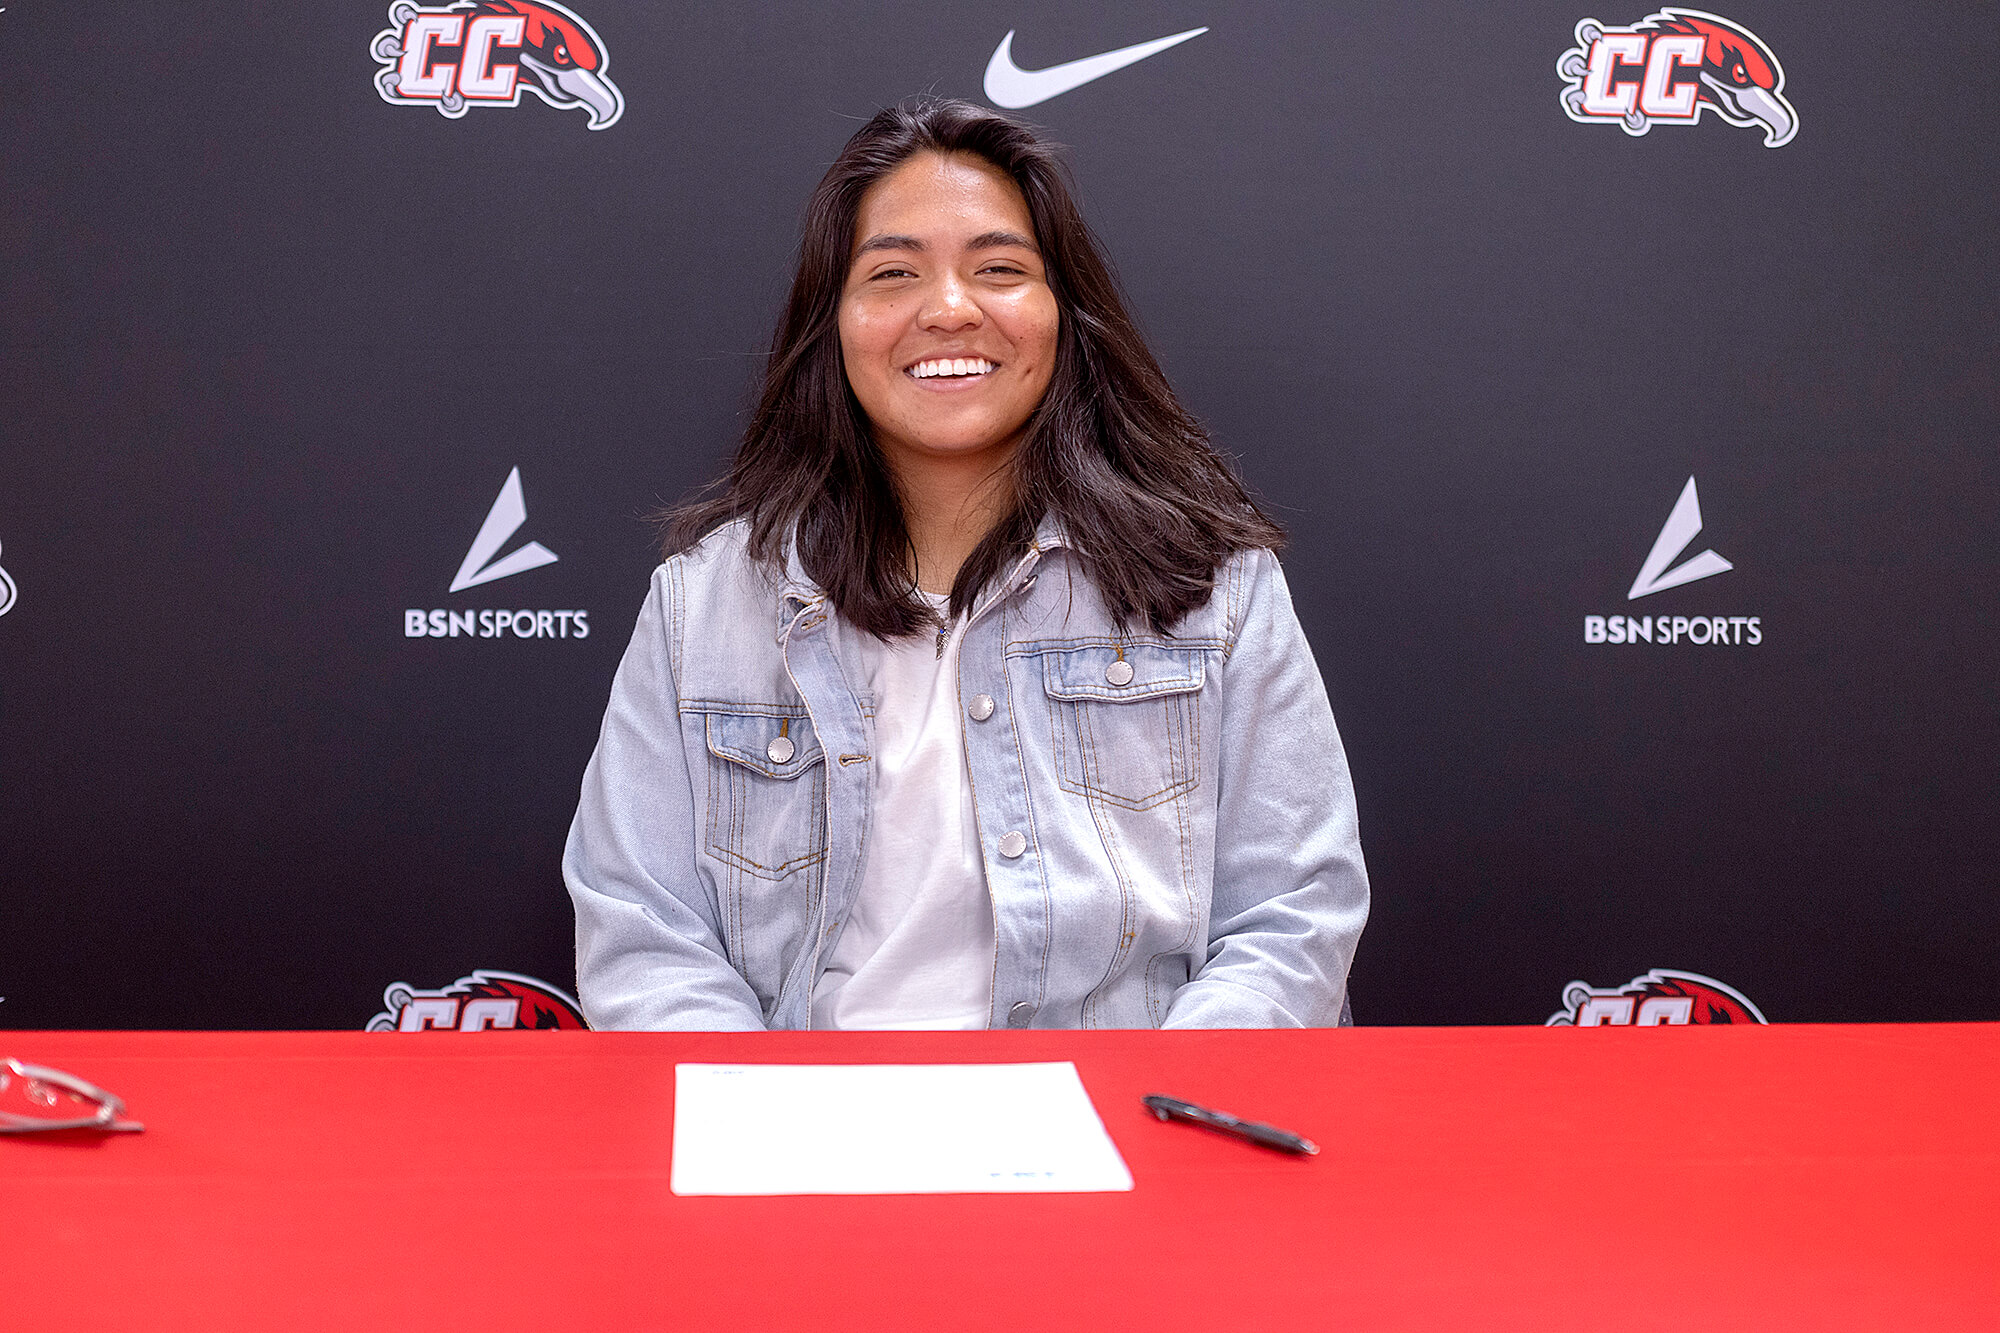 Photo of Casper College Women's Soccer team player Karla Gaytan.